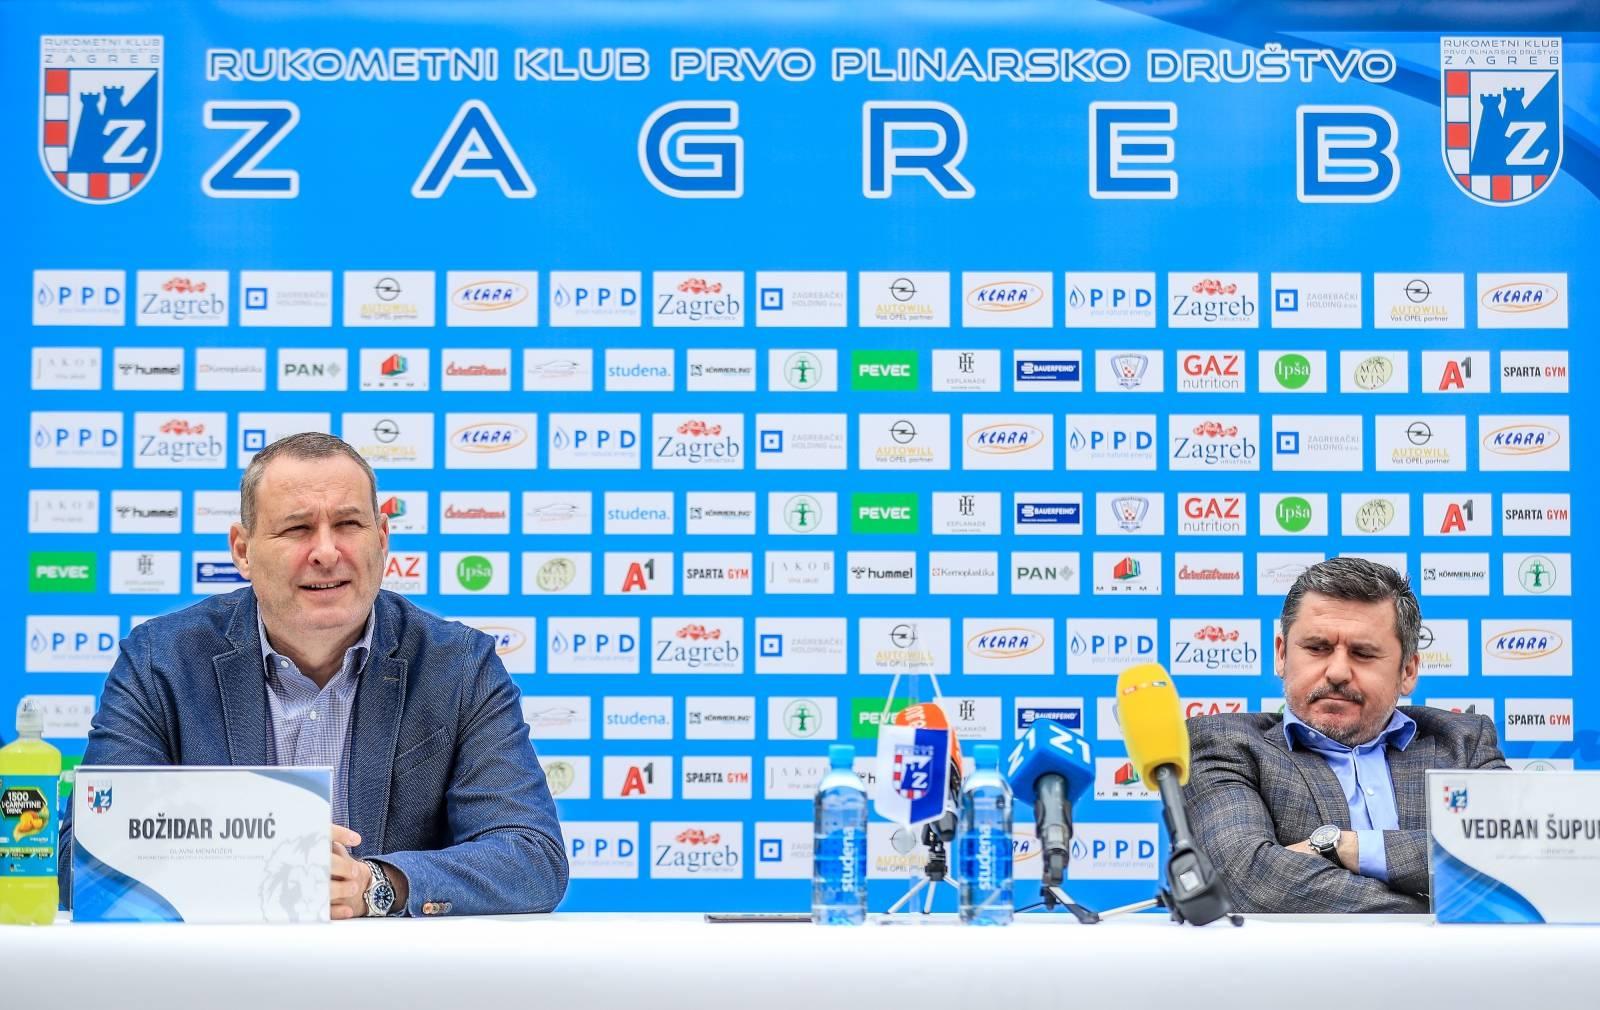 Konferencija za medije rukometnog kluba PPD Zagreb